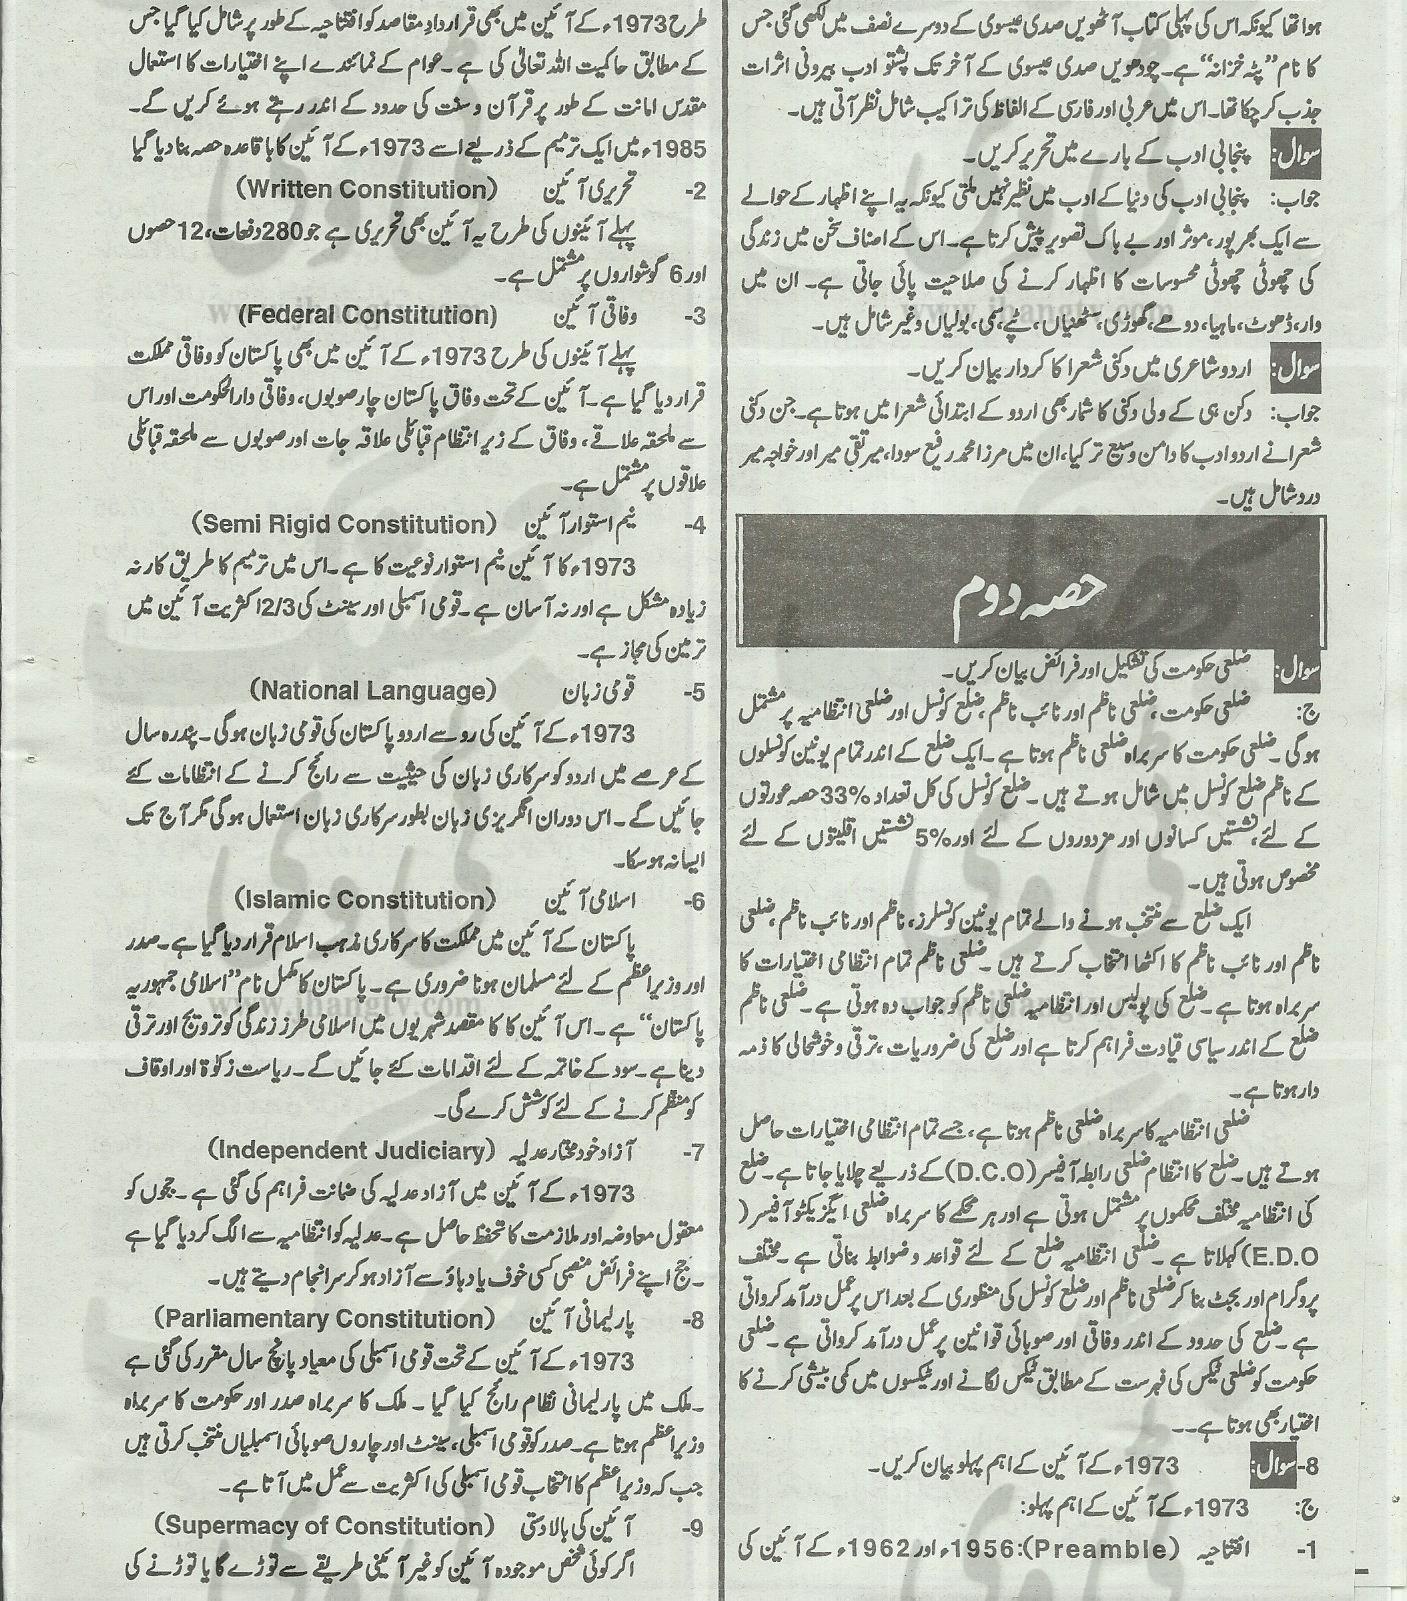 essays on pakistan affairs We provide excellent essay writing service 24/7 enjoy proficient essay writing and custom writing services provided by professional academic writers.